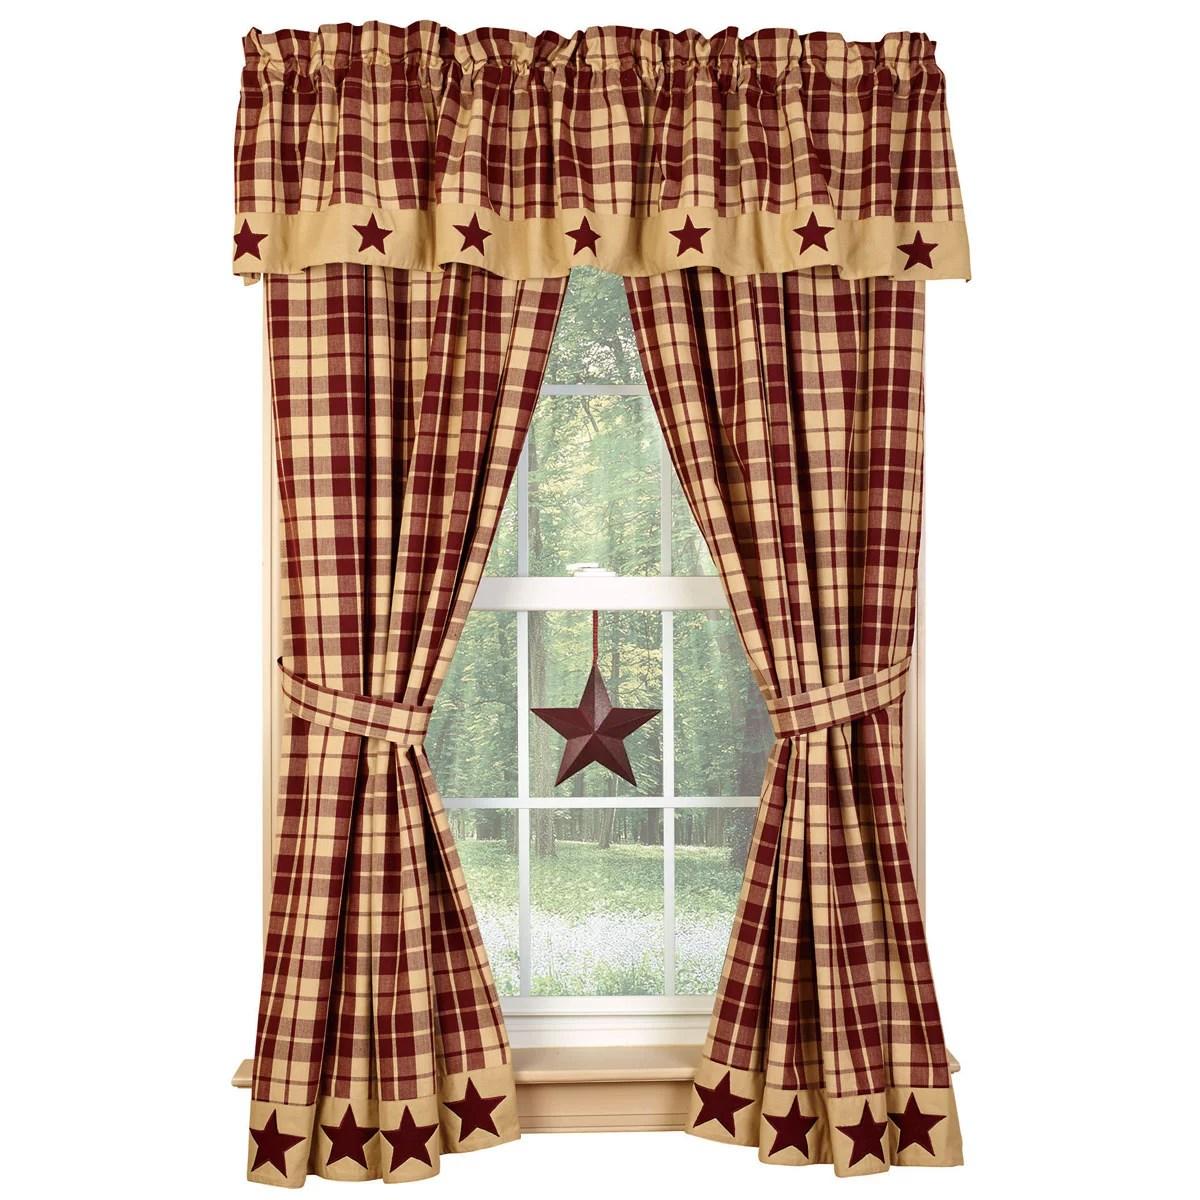 farmhouse star lined curtain panels burgundy or black and tan 63 84 lengths